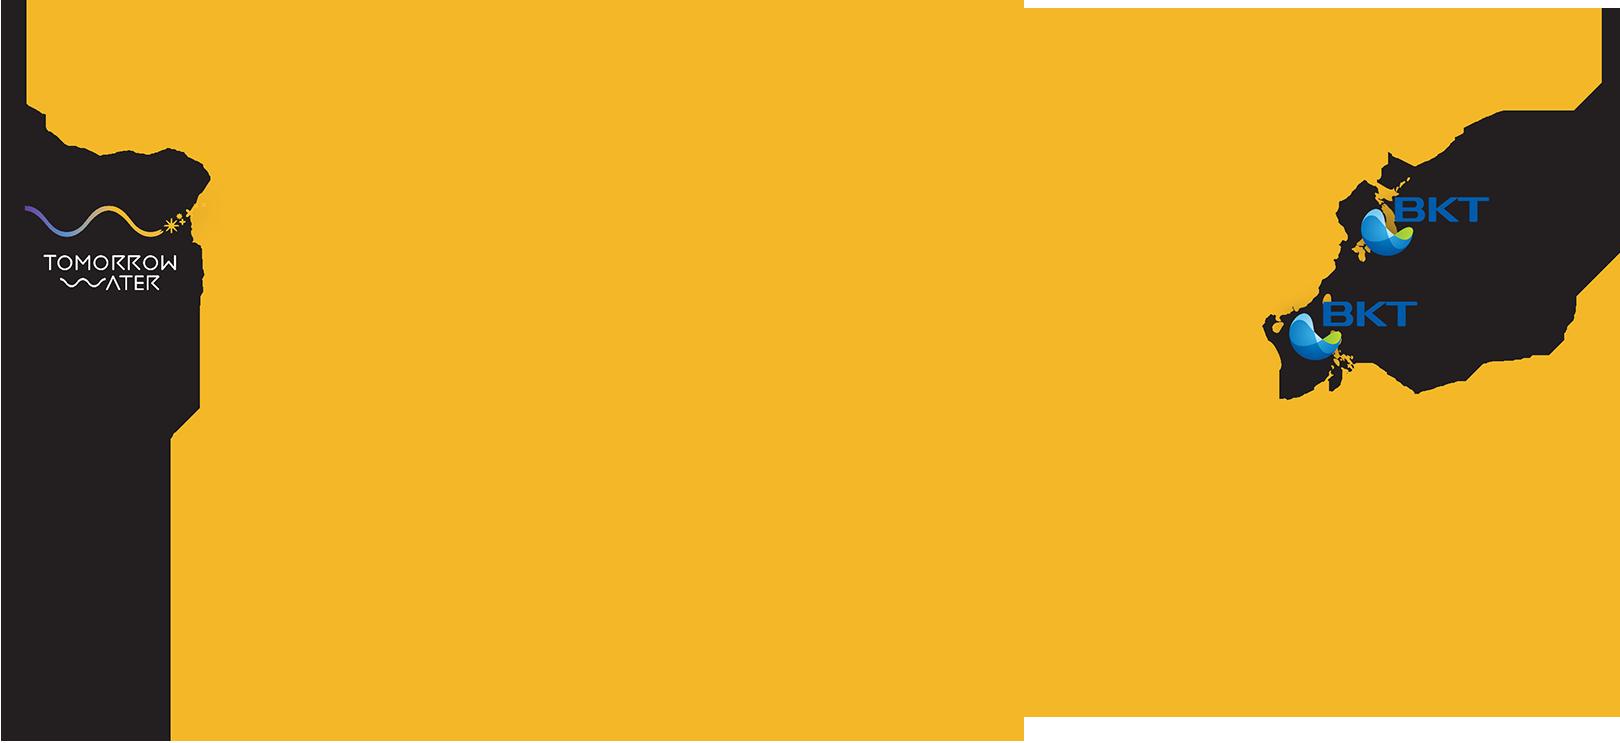 WorldMap-yellow.png